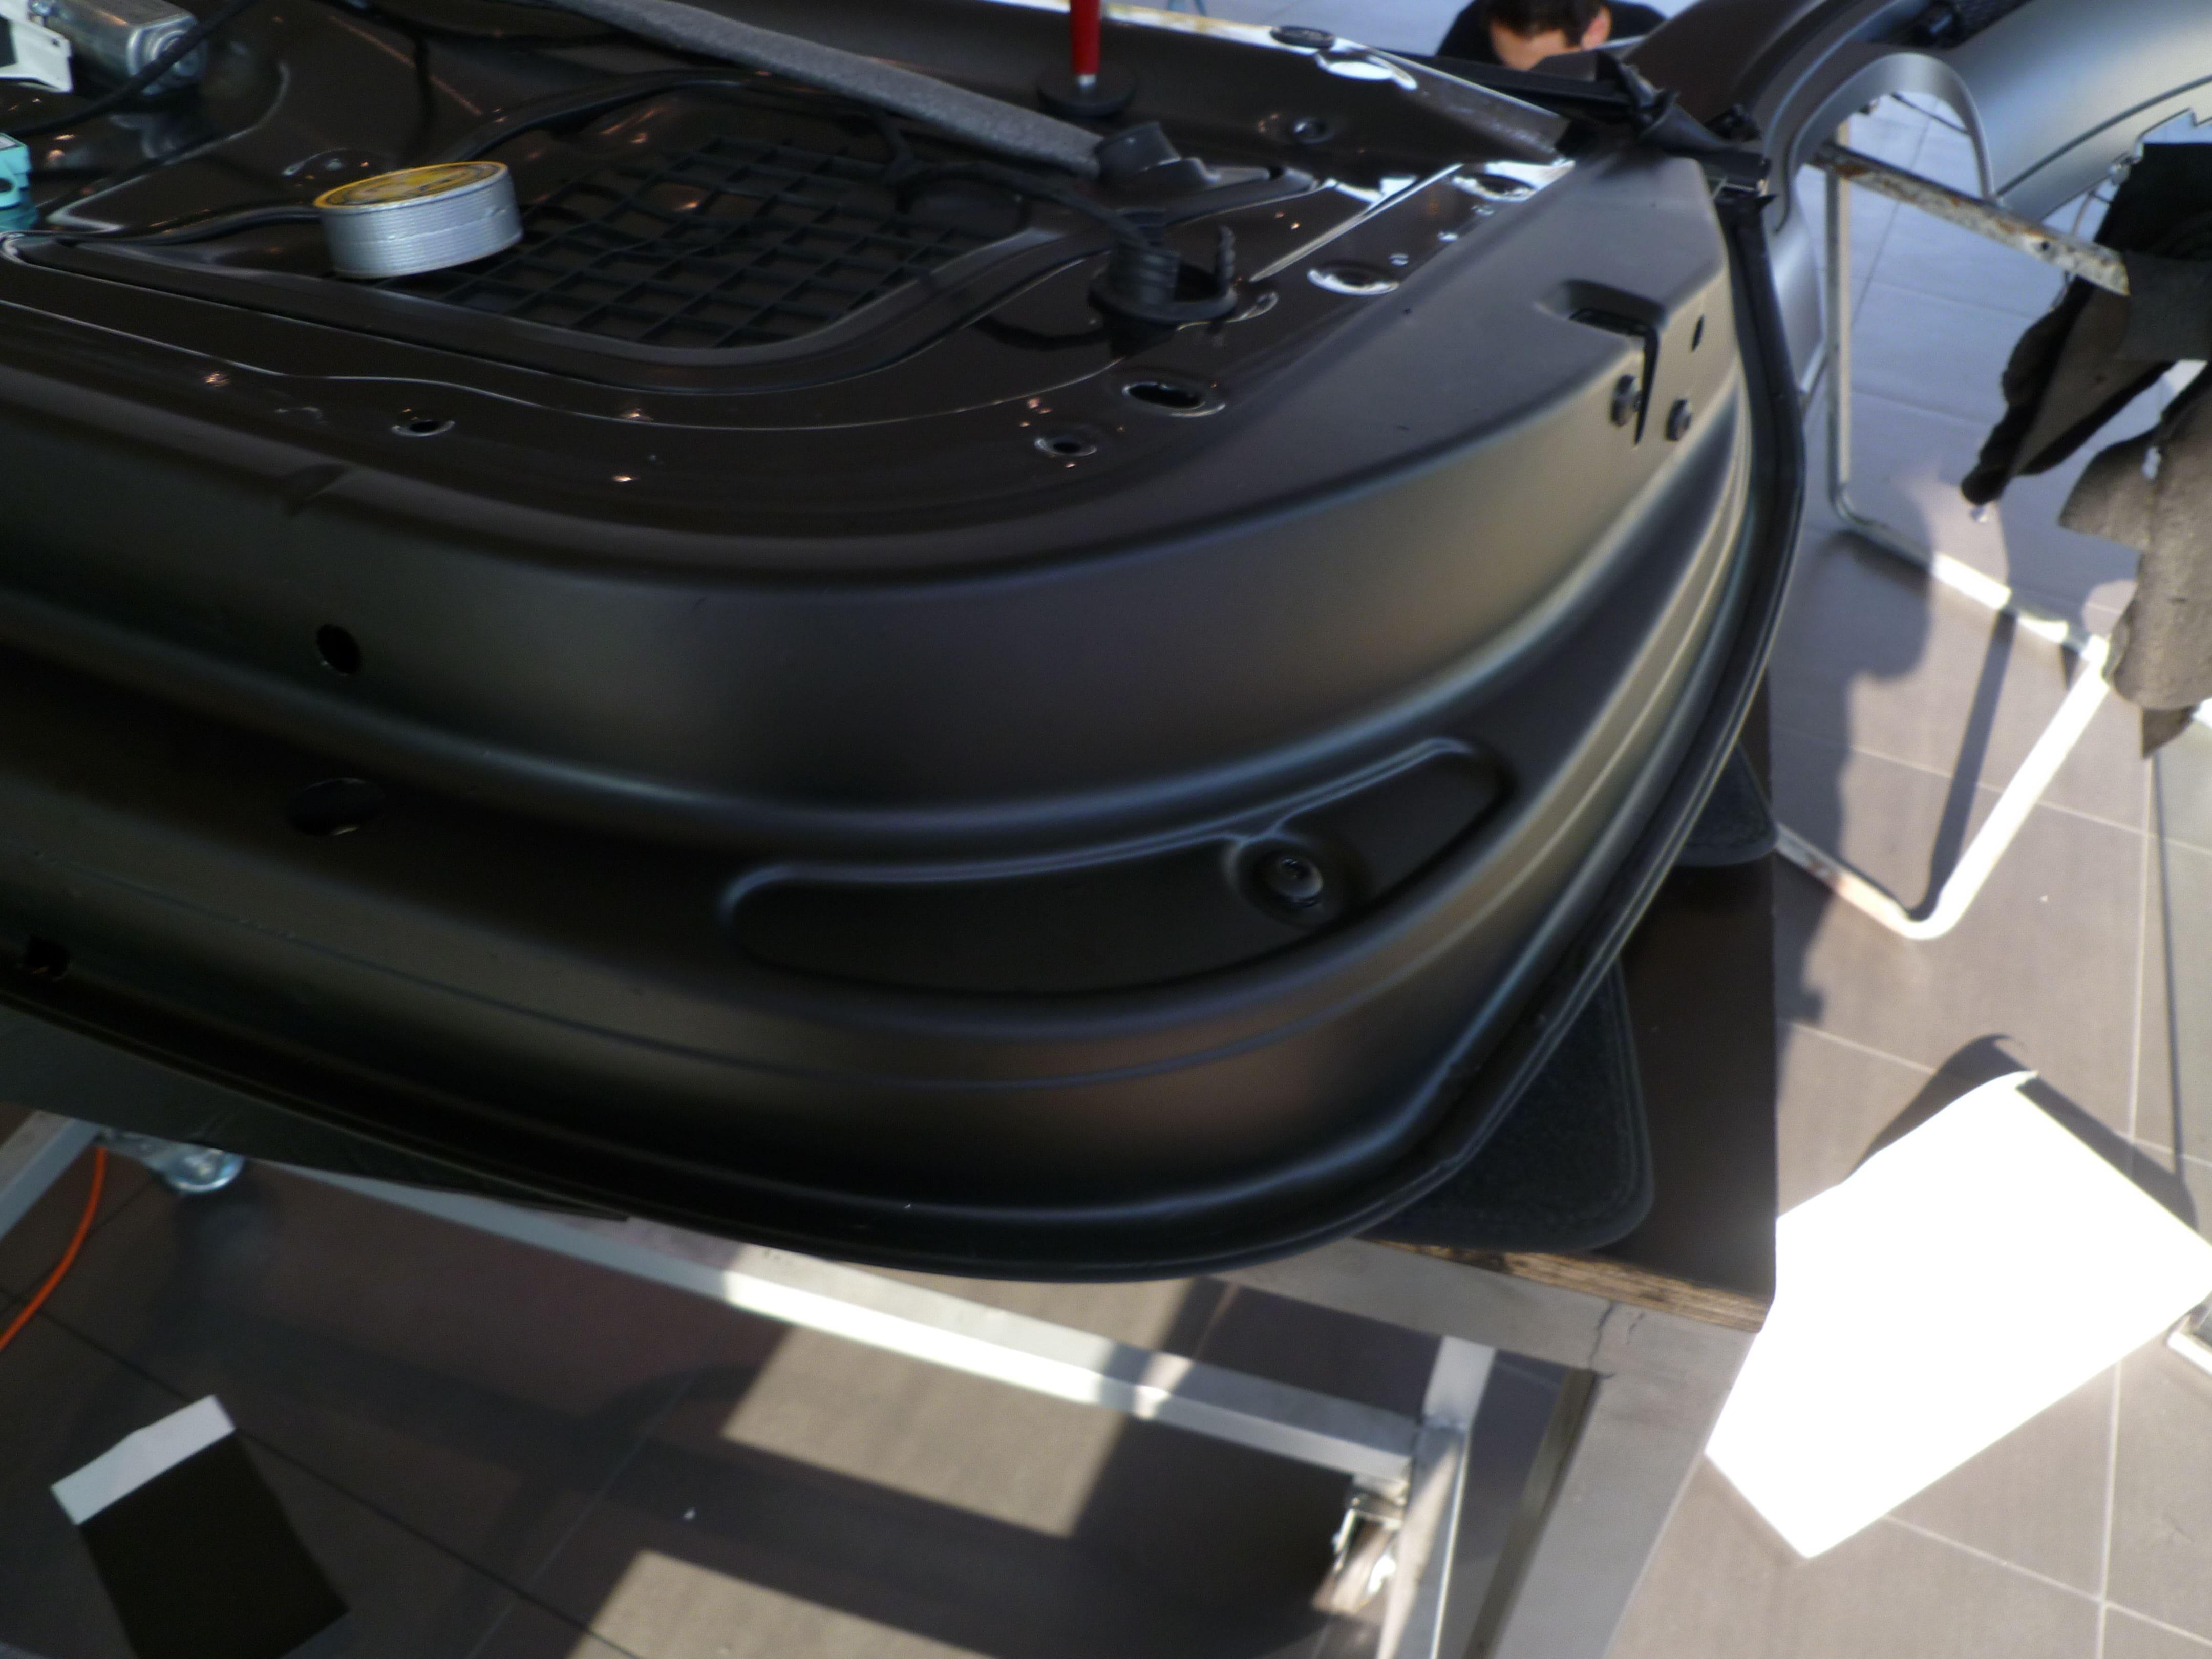 Audi A5 Coupe met Mat Zwarte Wrap, Carwrapping door Wrapmyride.nu Foto-nr:4639, ©2021